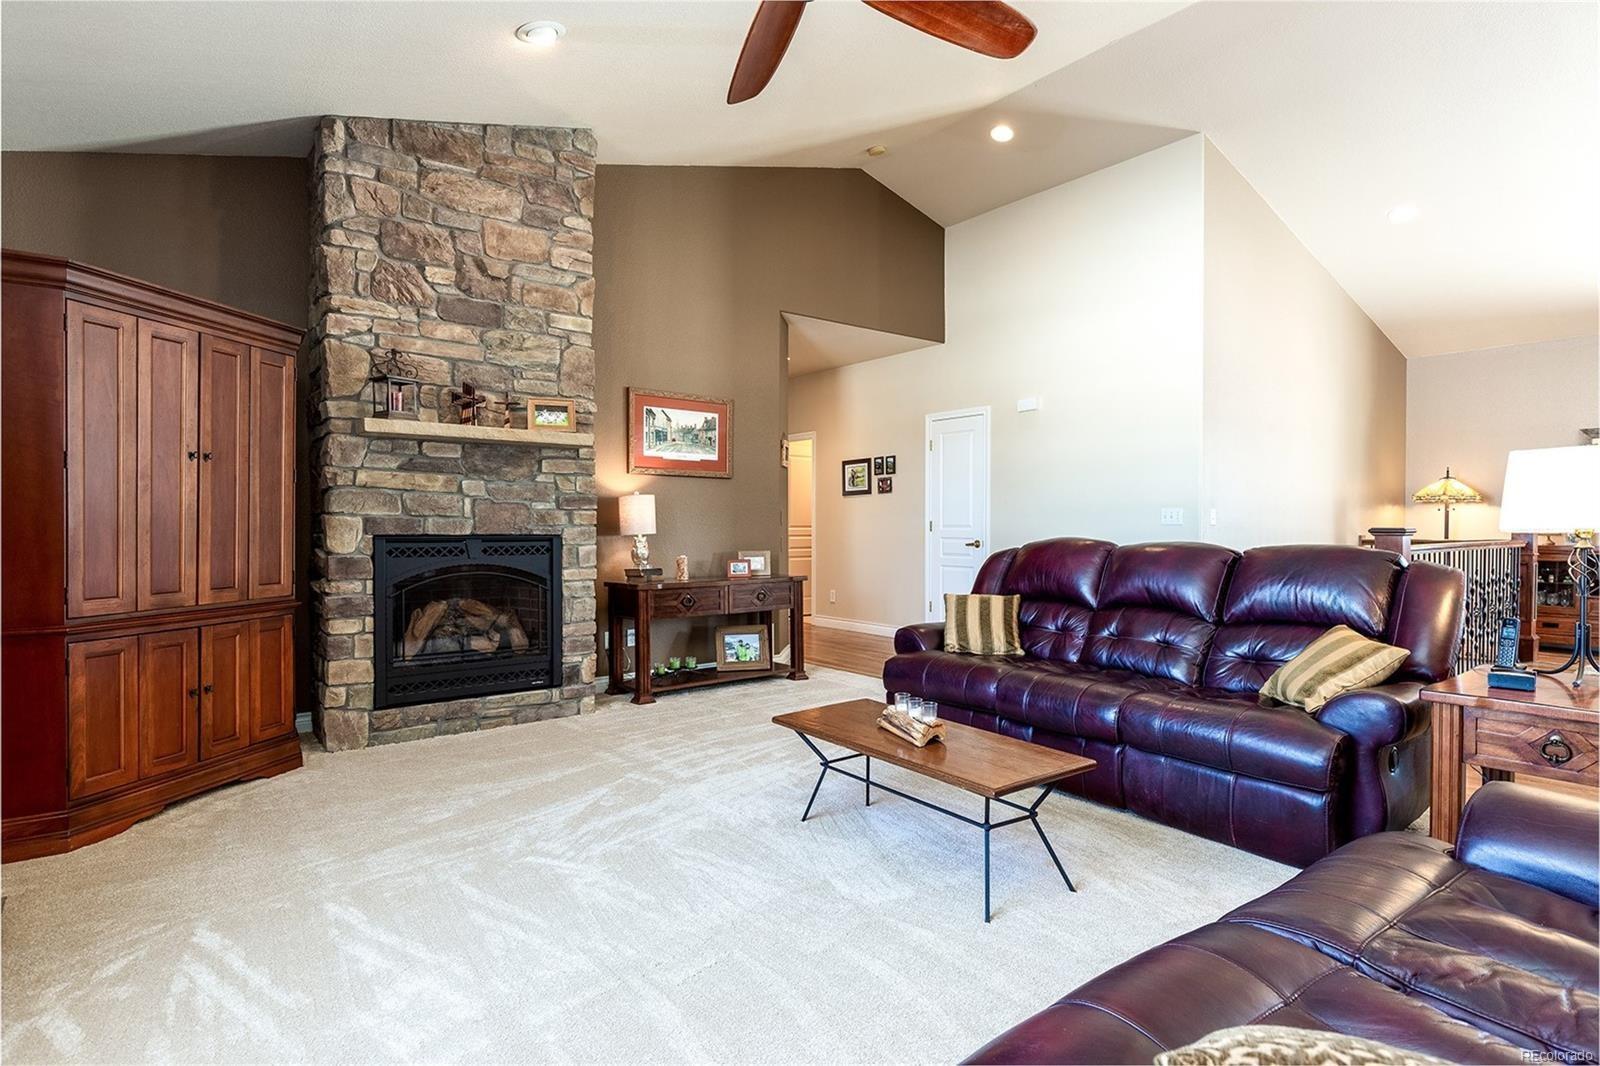 MLS# 4807349 - 5 - 15325 Terra Ridge Circle, Colorado Springs, CO 80908